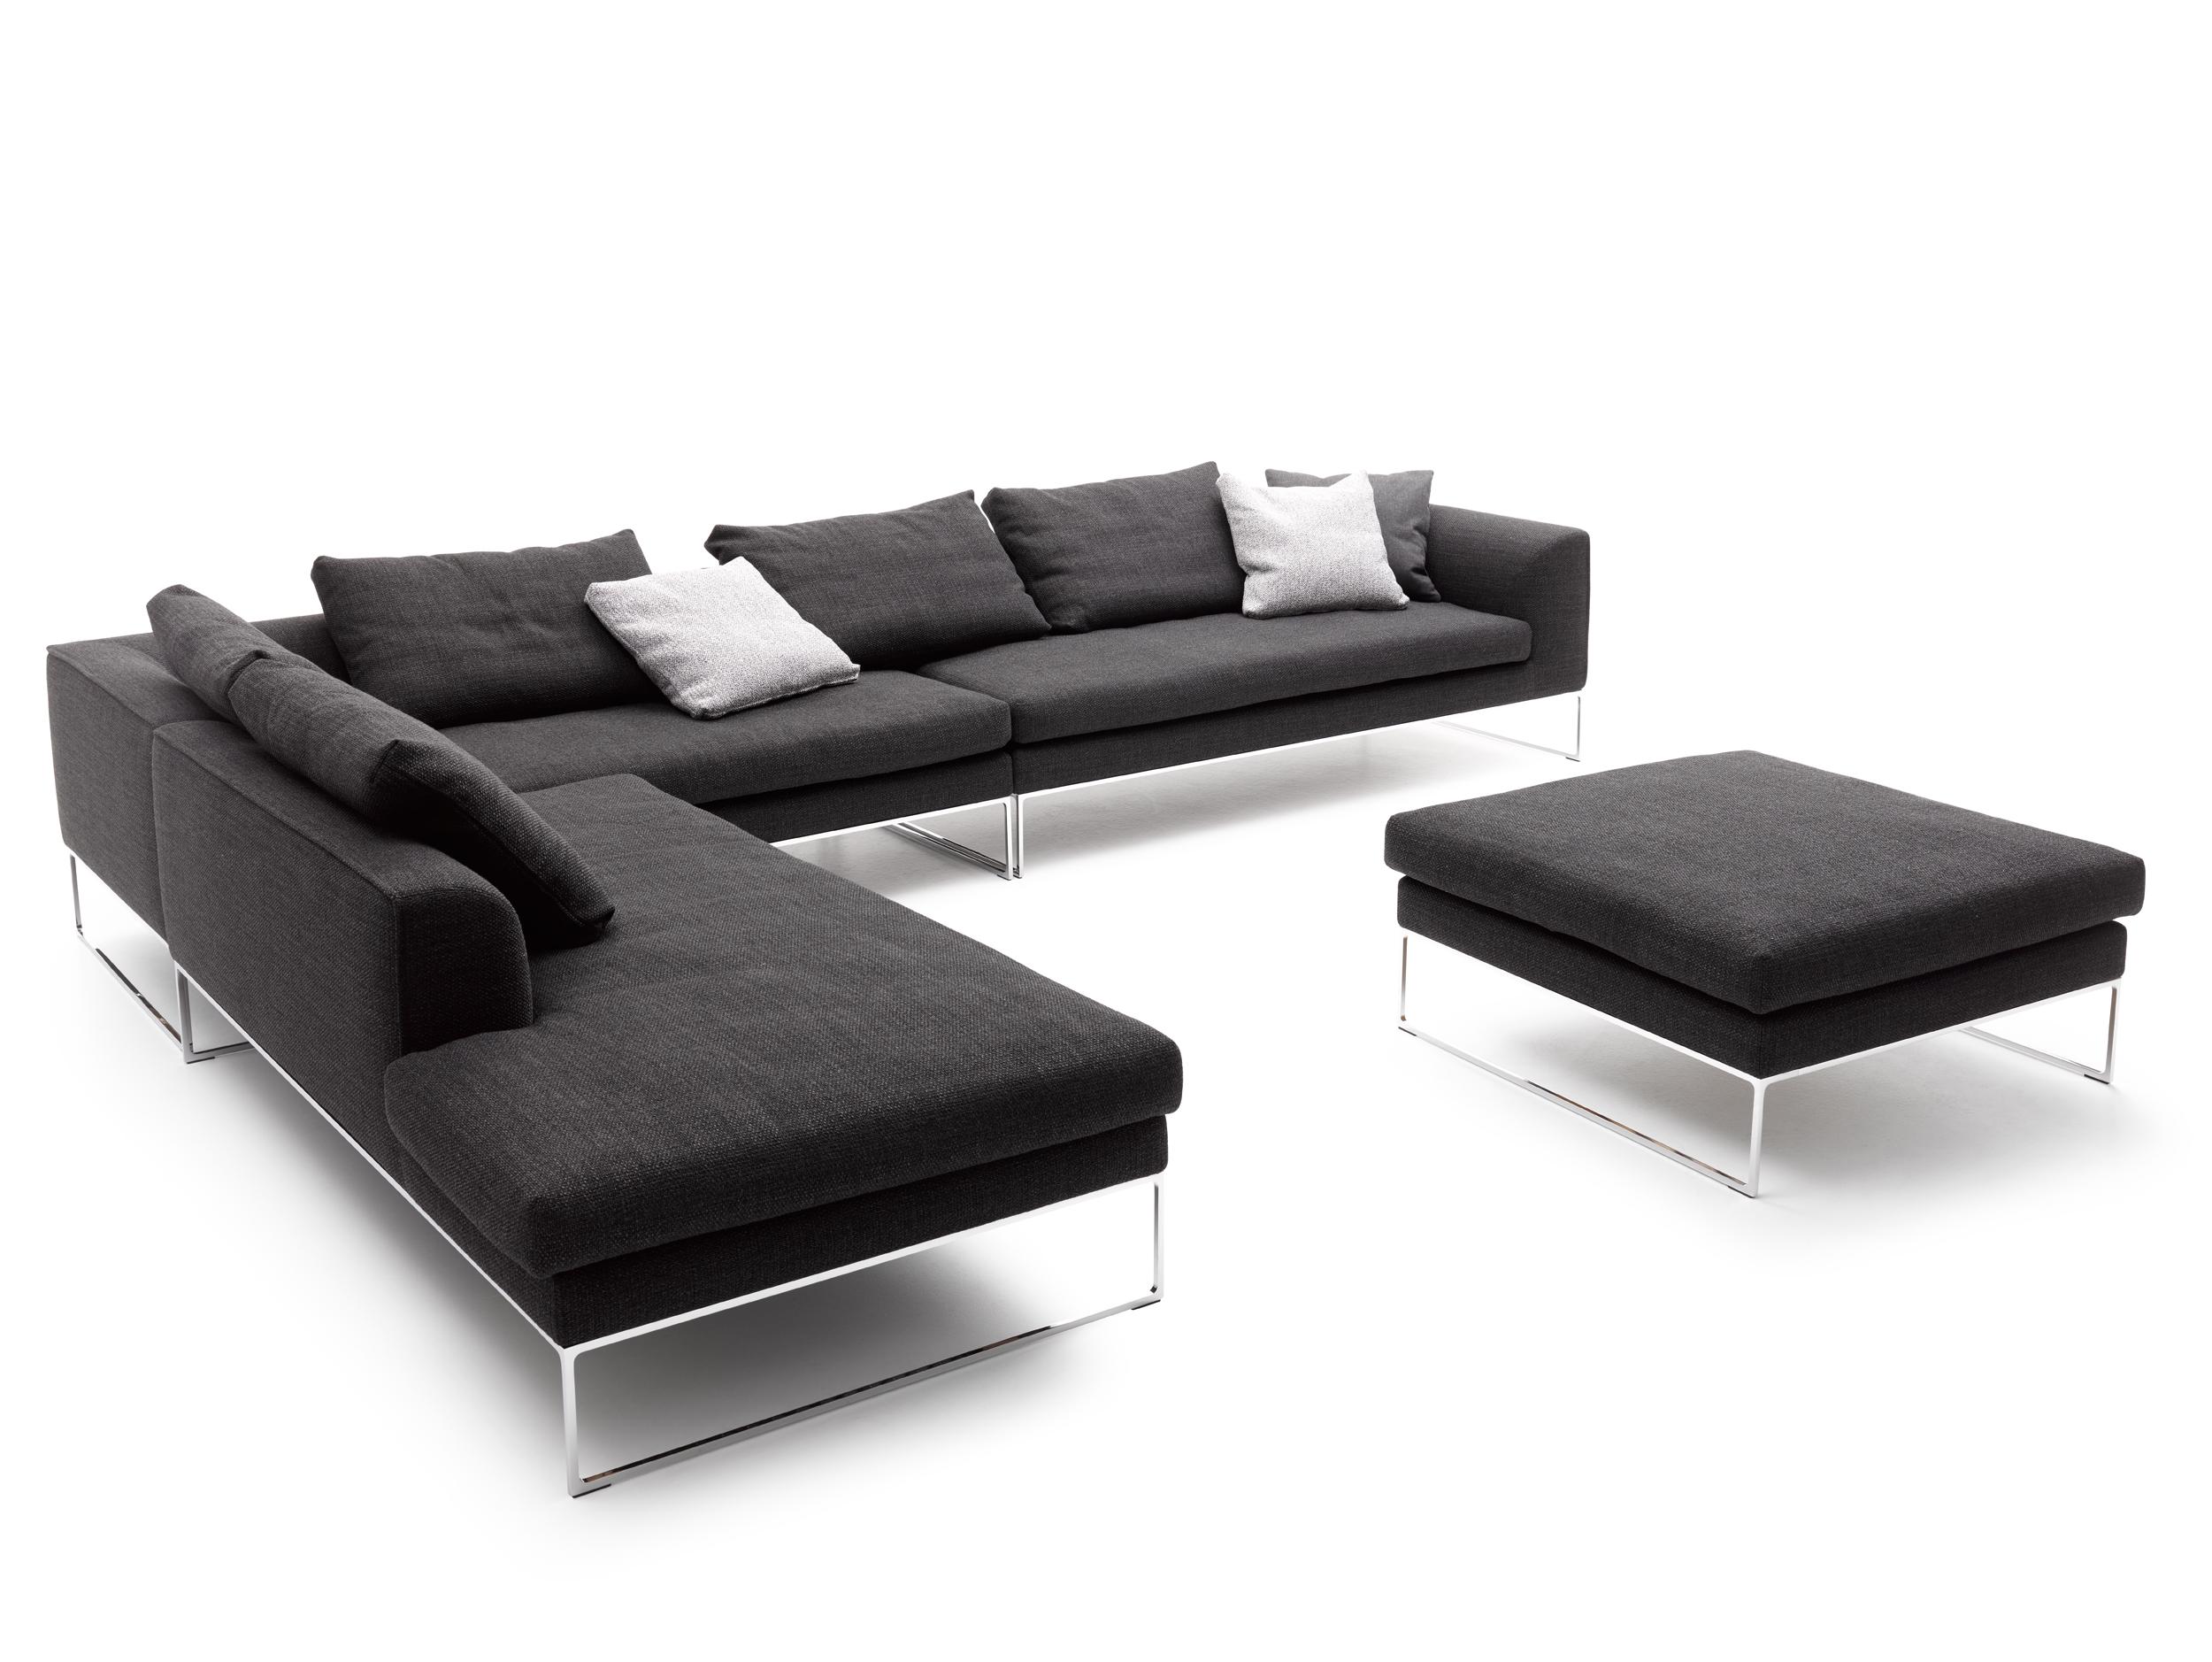 Sofa Bilder cor sofa mell lounge home the honoroak